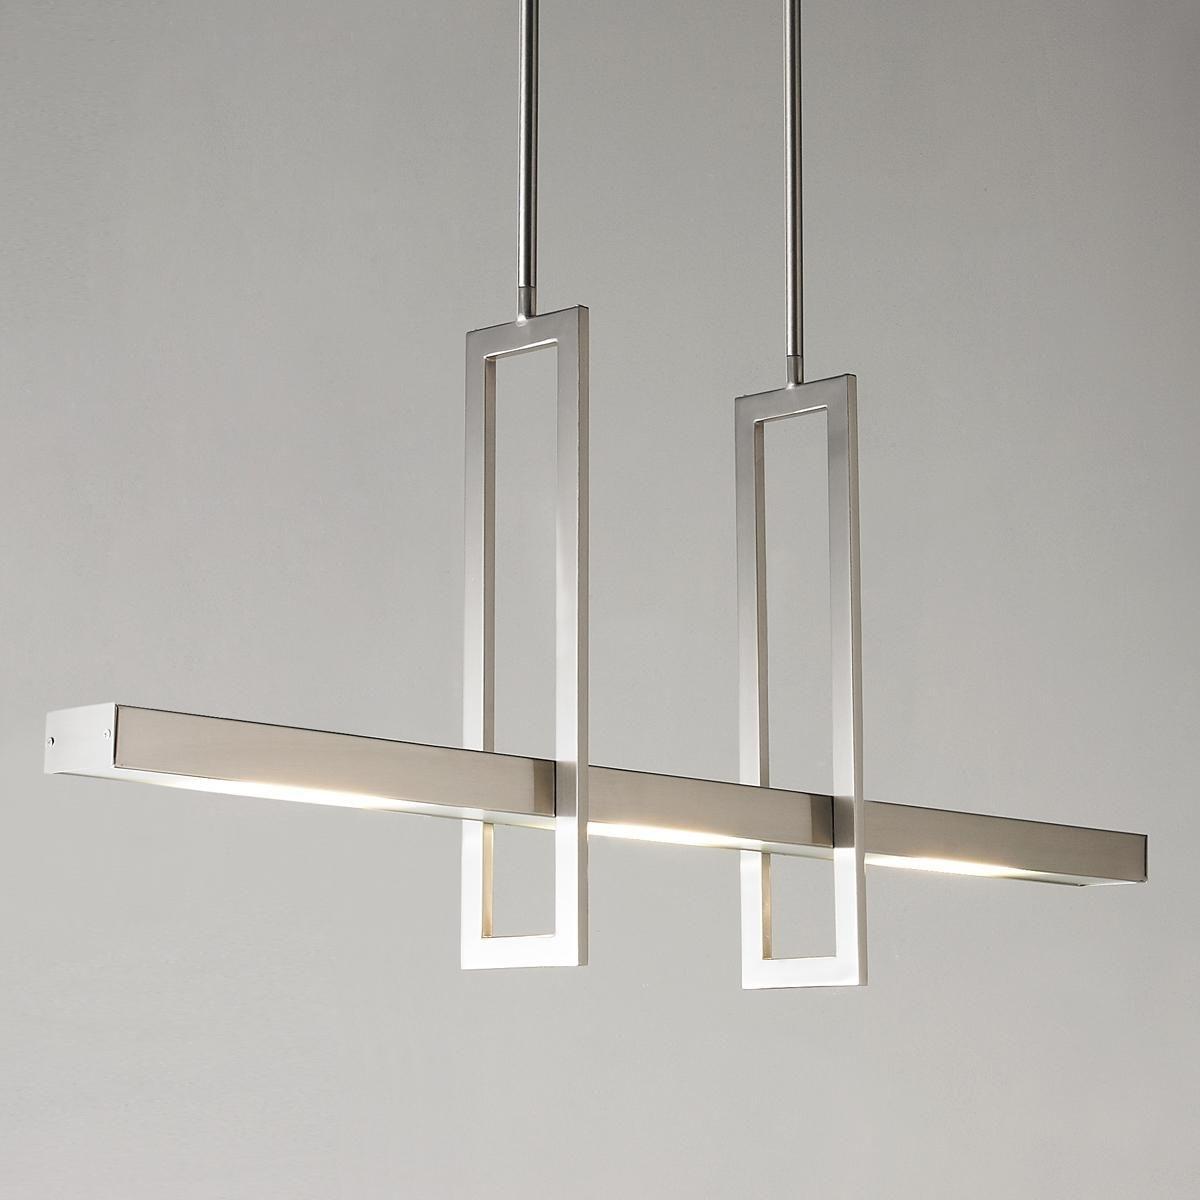 Beams Regarding Modern Chandelier Lighting (View 1 of 15)